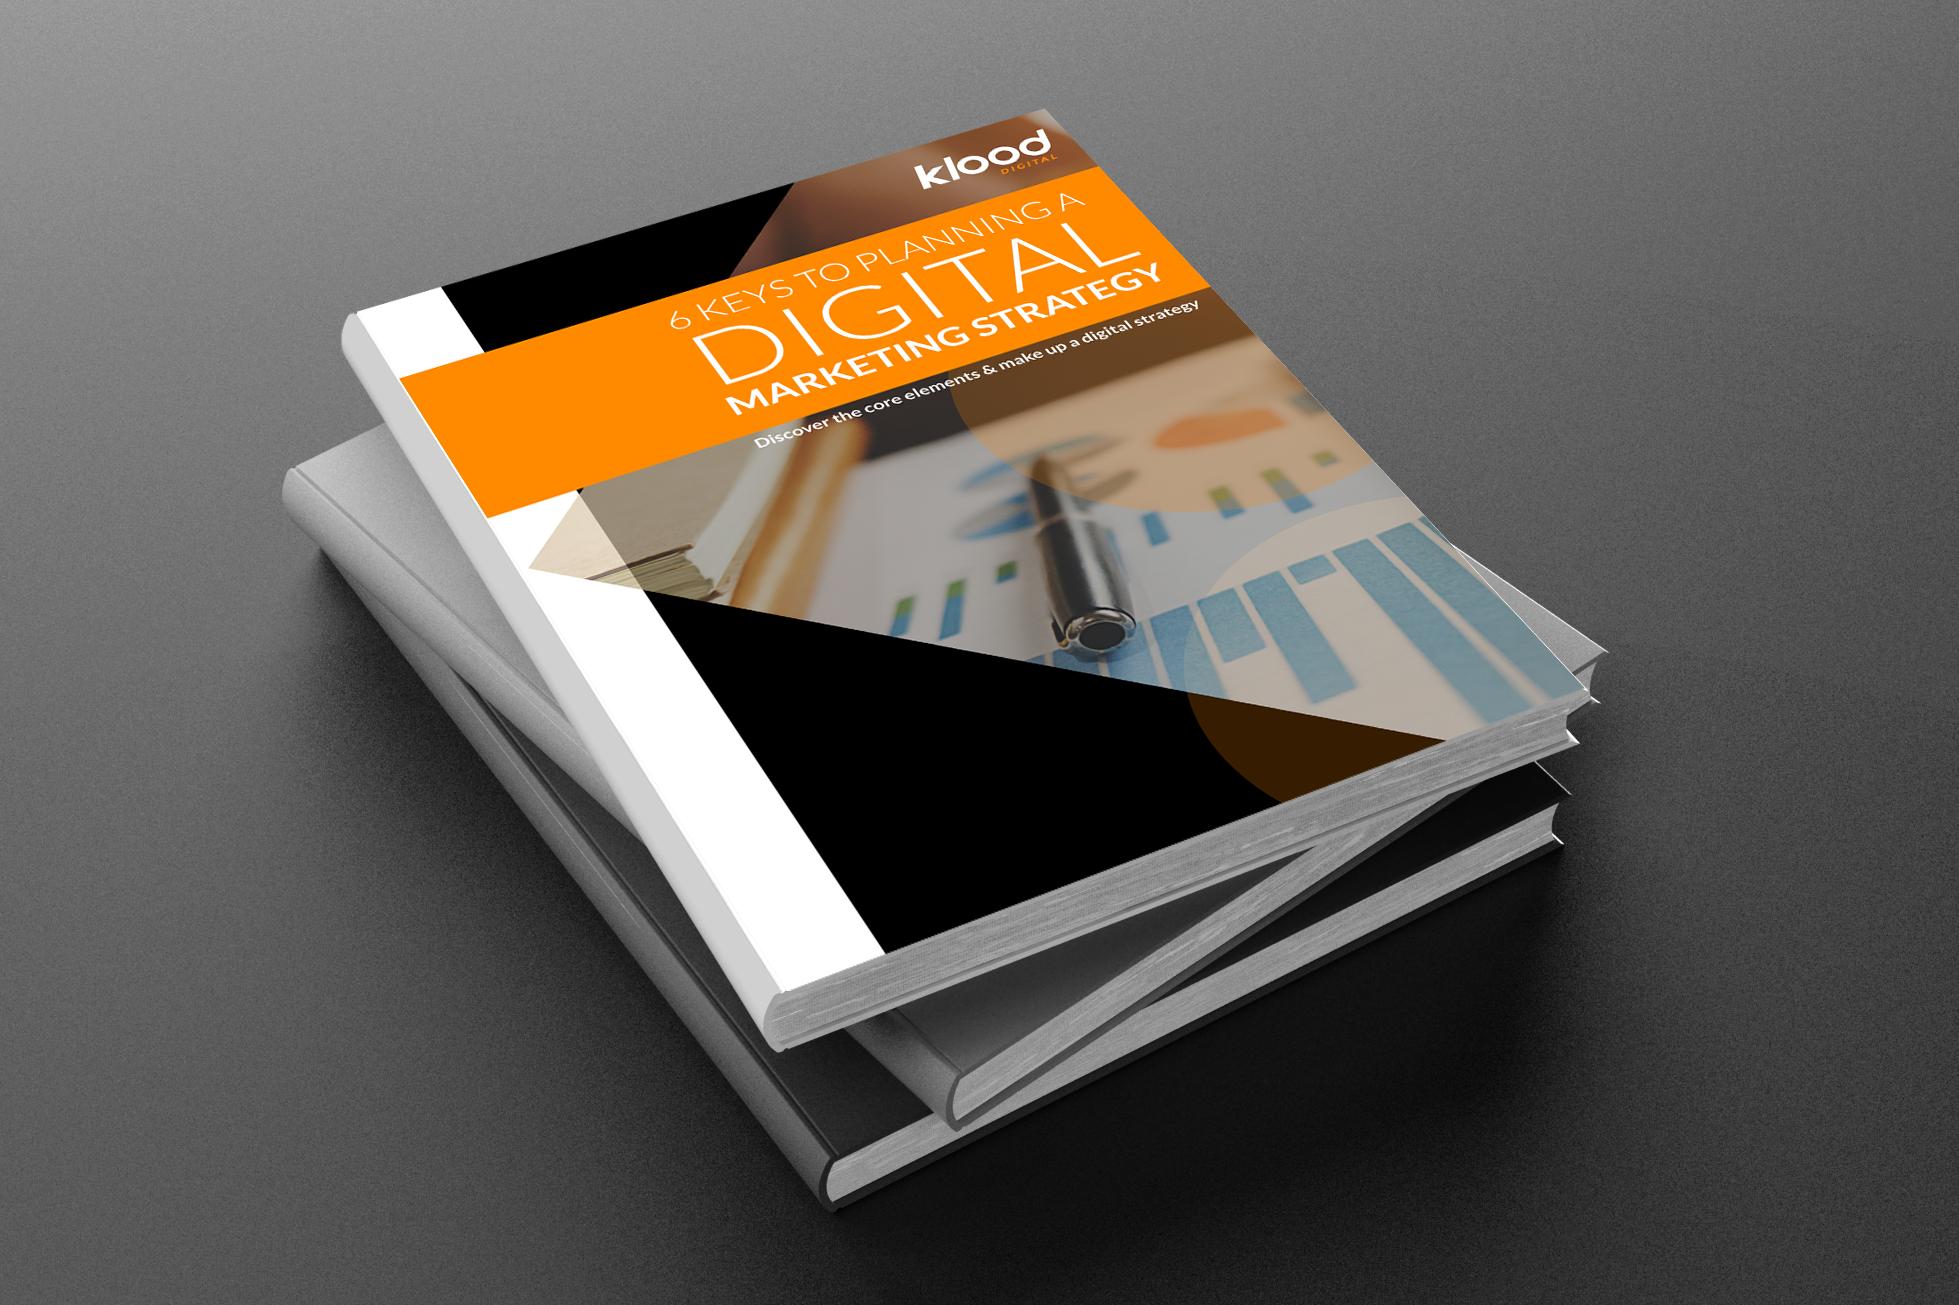 cta-digital-marketing-strategy